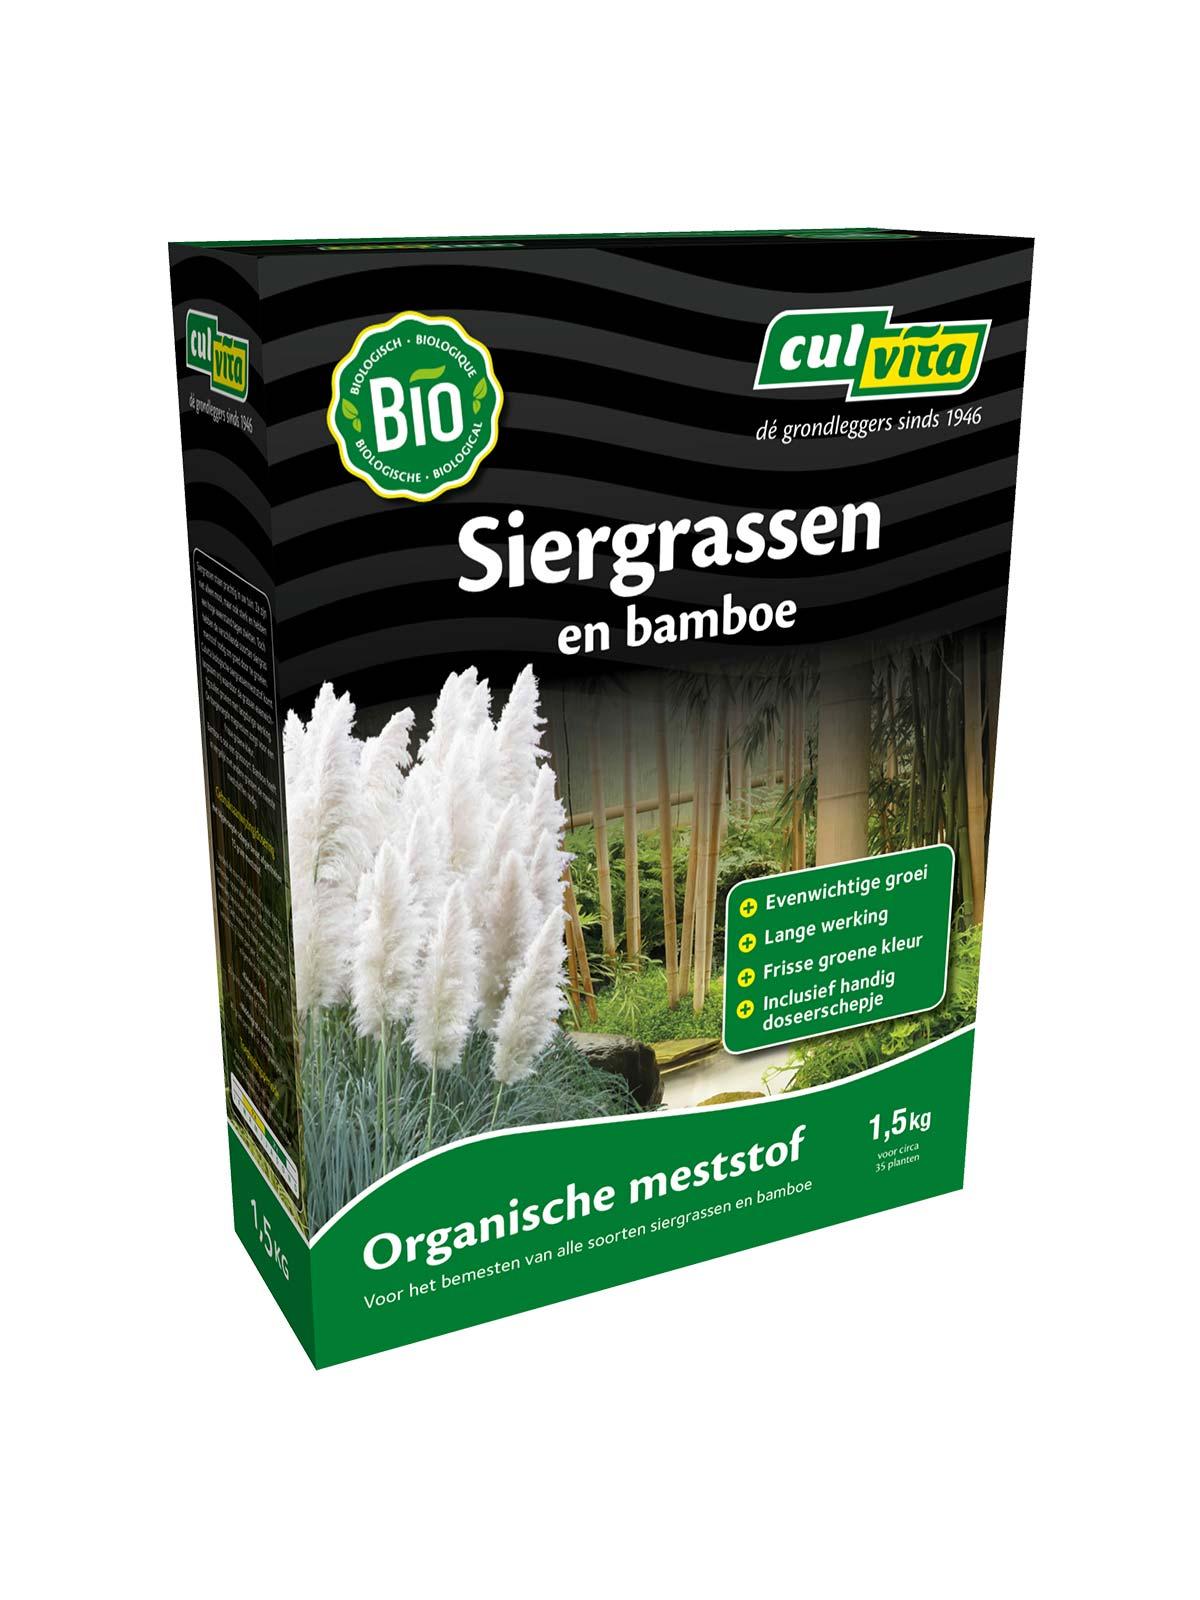 Culvita Organische Siergrassen En Bamboe Meststof